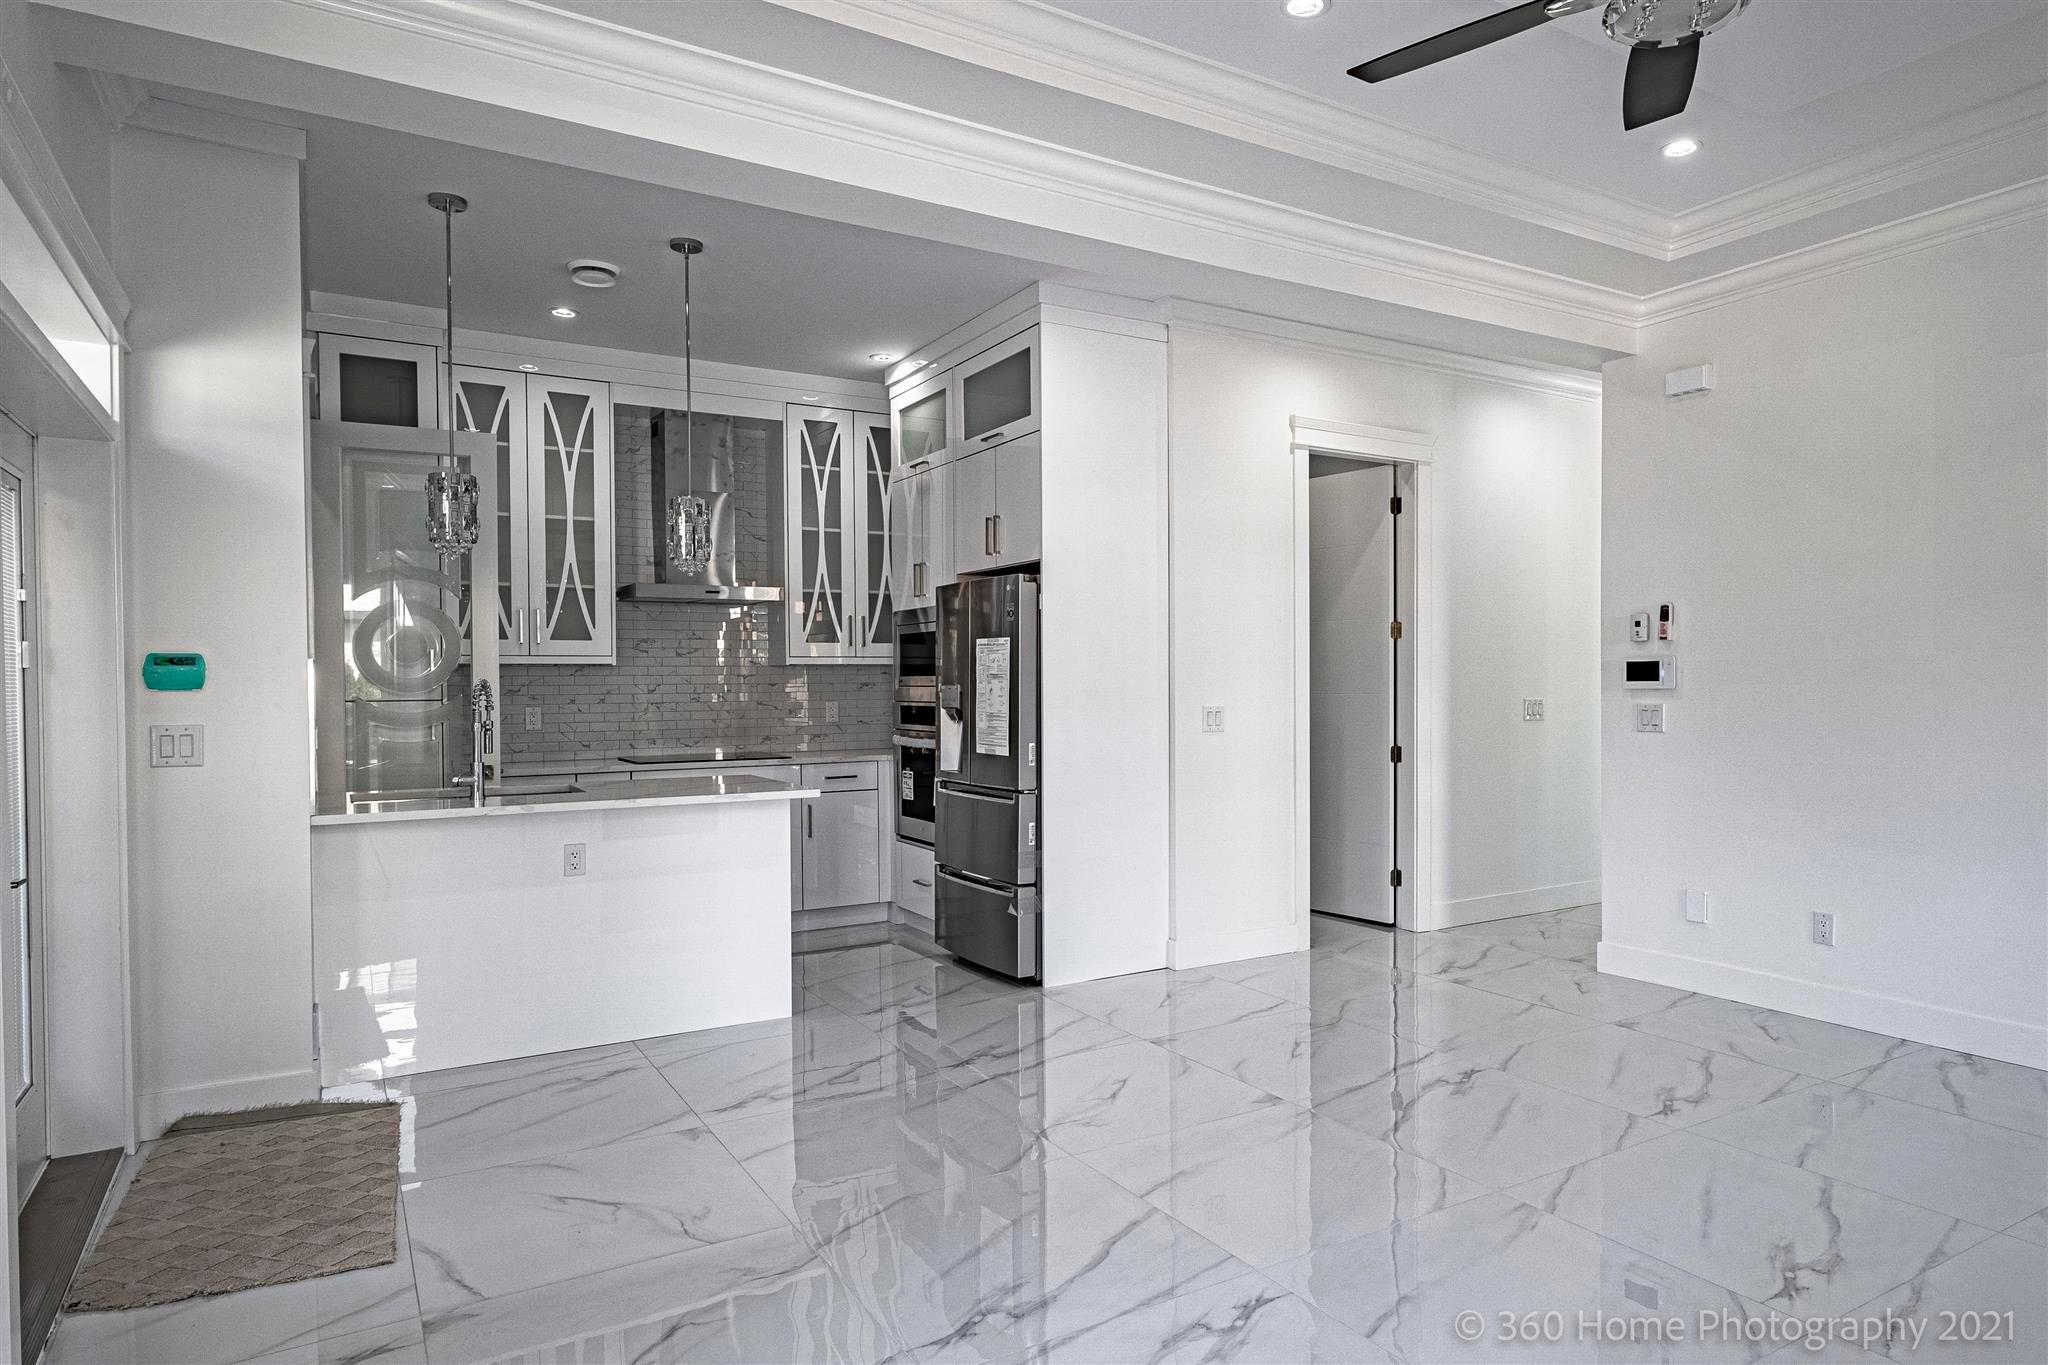 13050 101B AVENUE - Cedar Hills House/Single Family for sale, 5 Bedrooms (R2602208) - #25